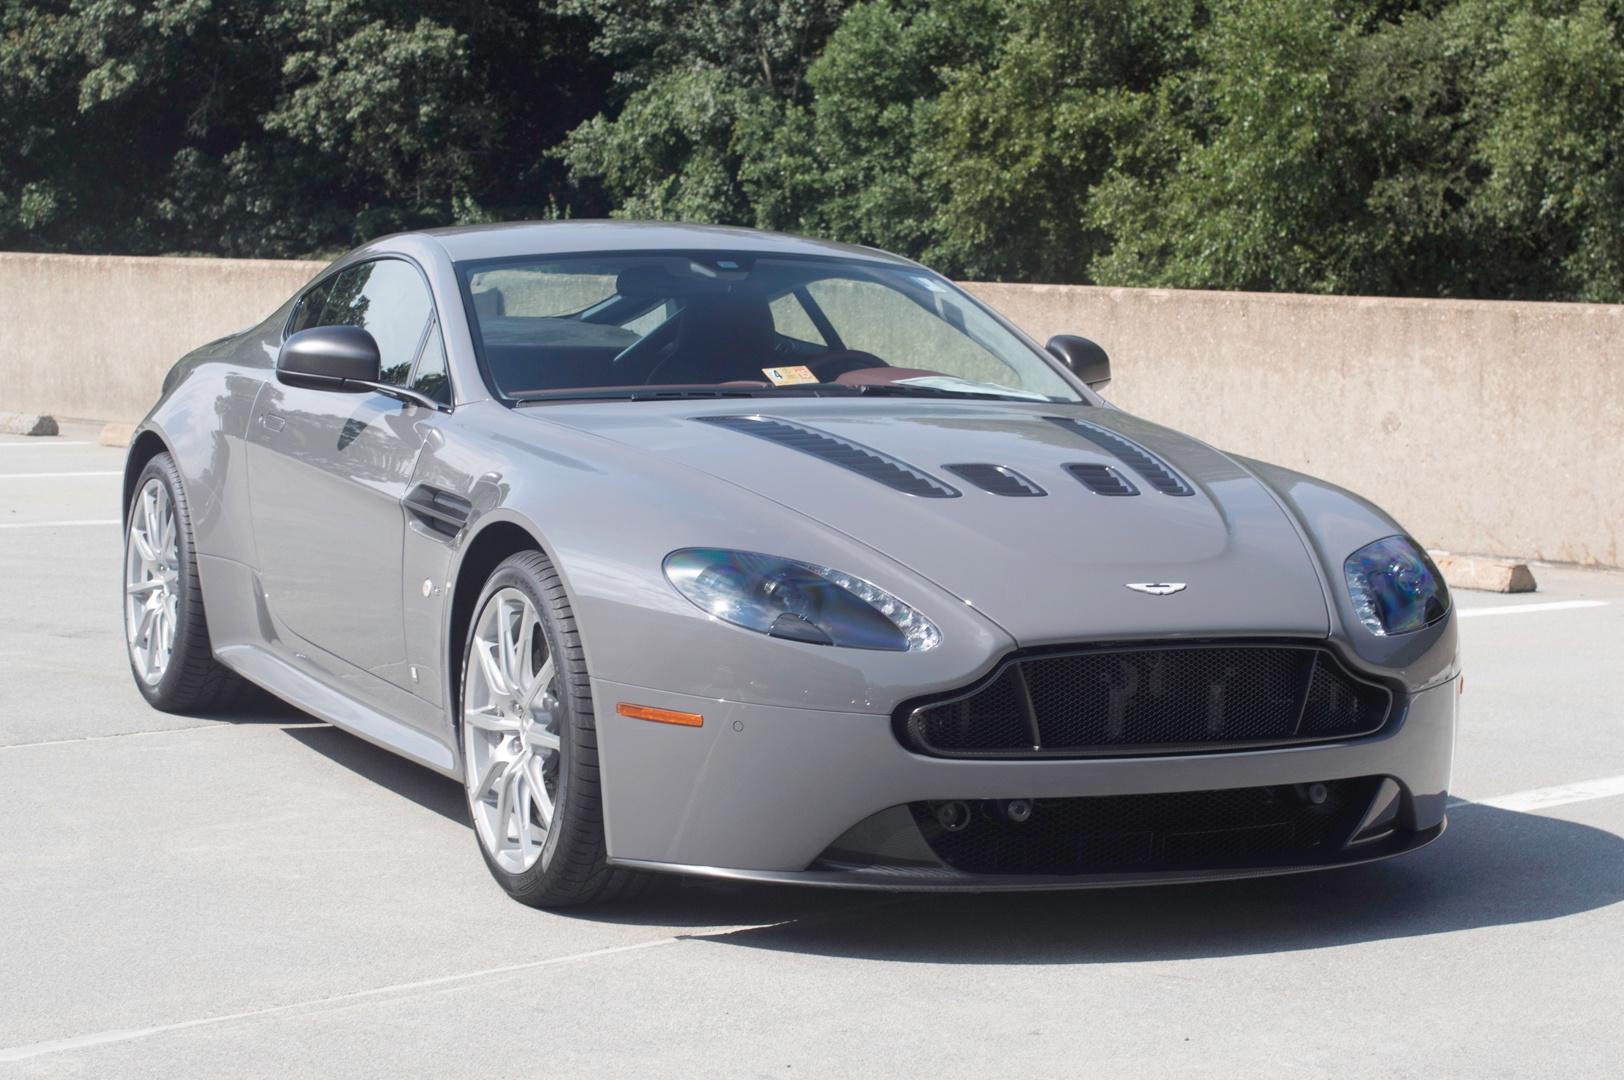 2015 Aston Martin V12 Vantage Coupe Stock 5ns01663 For Sale Near